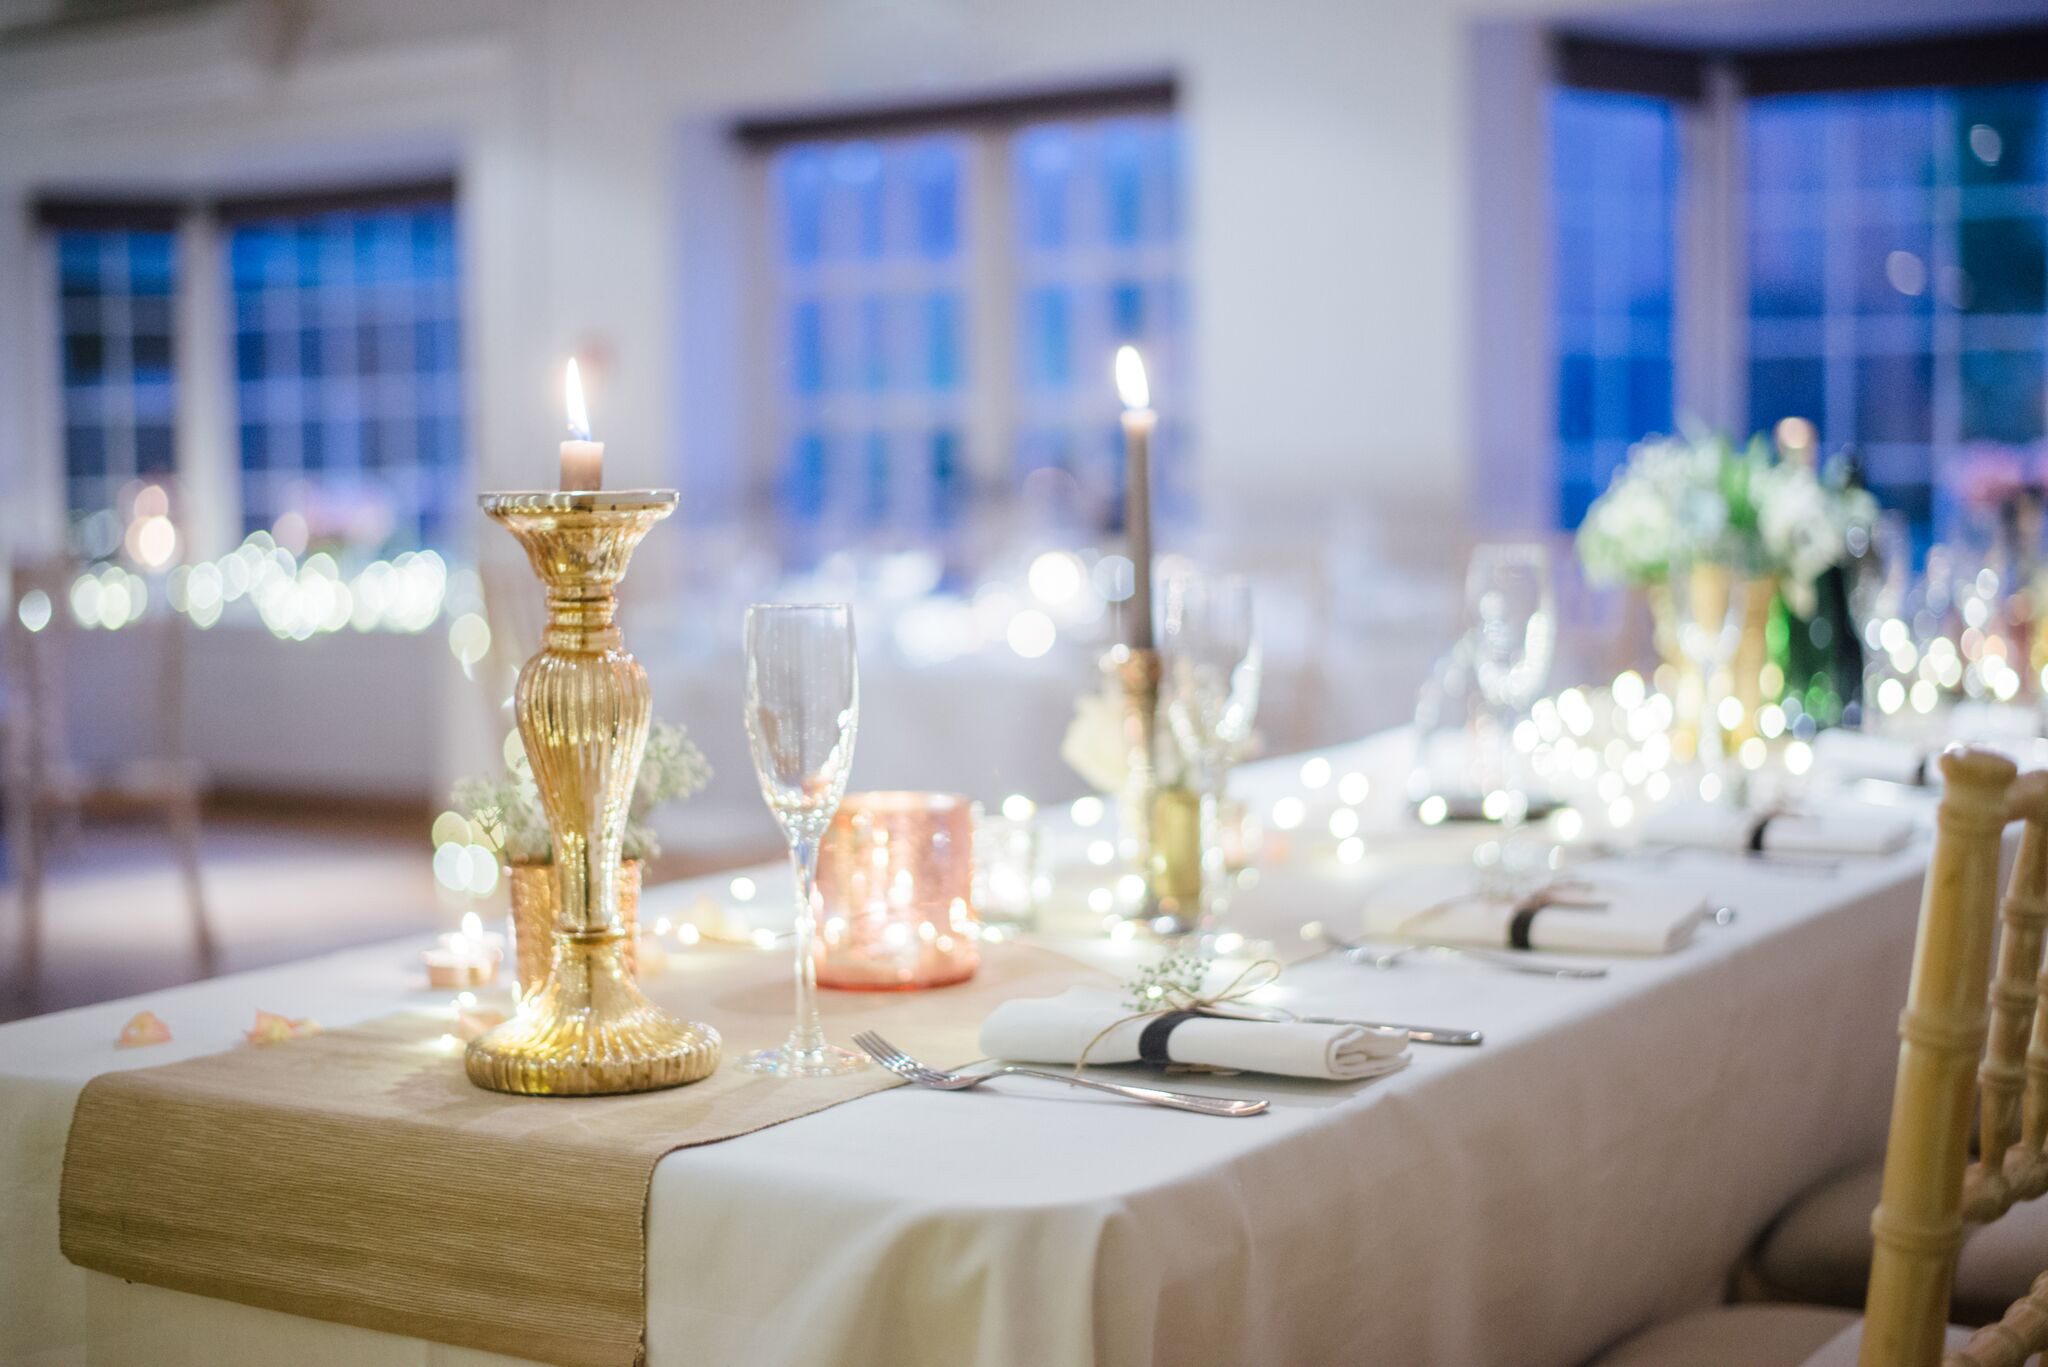 Blue Boar Bosworth Function Table Wedding:Party.jpg